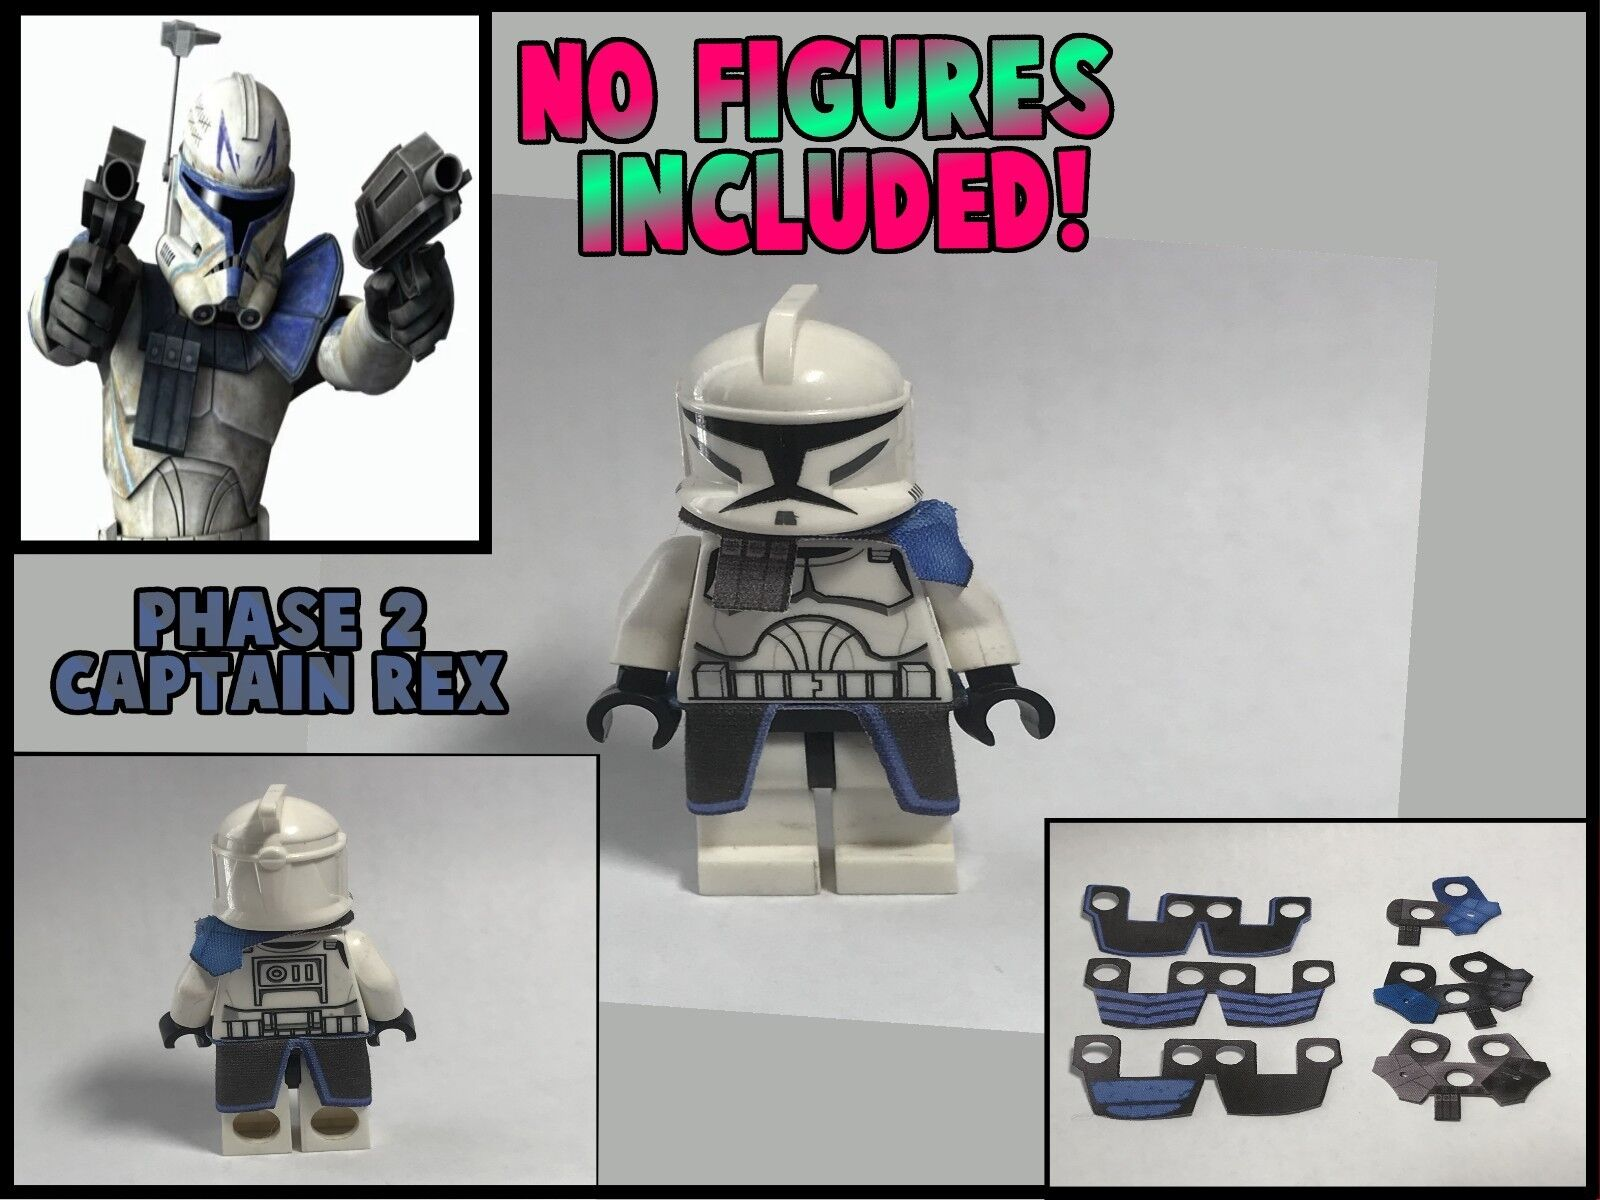 LEGO Star Wars Minifigure Lot of 2 Phase 2 Arc Echo Clone Kama and Pauldron